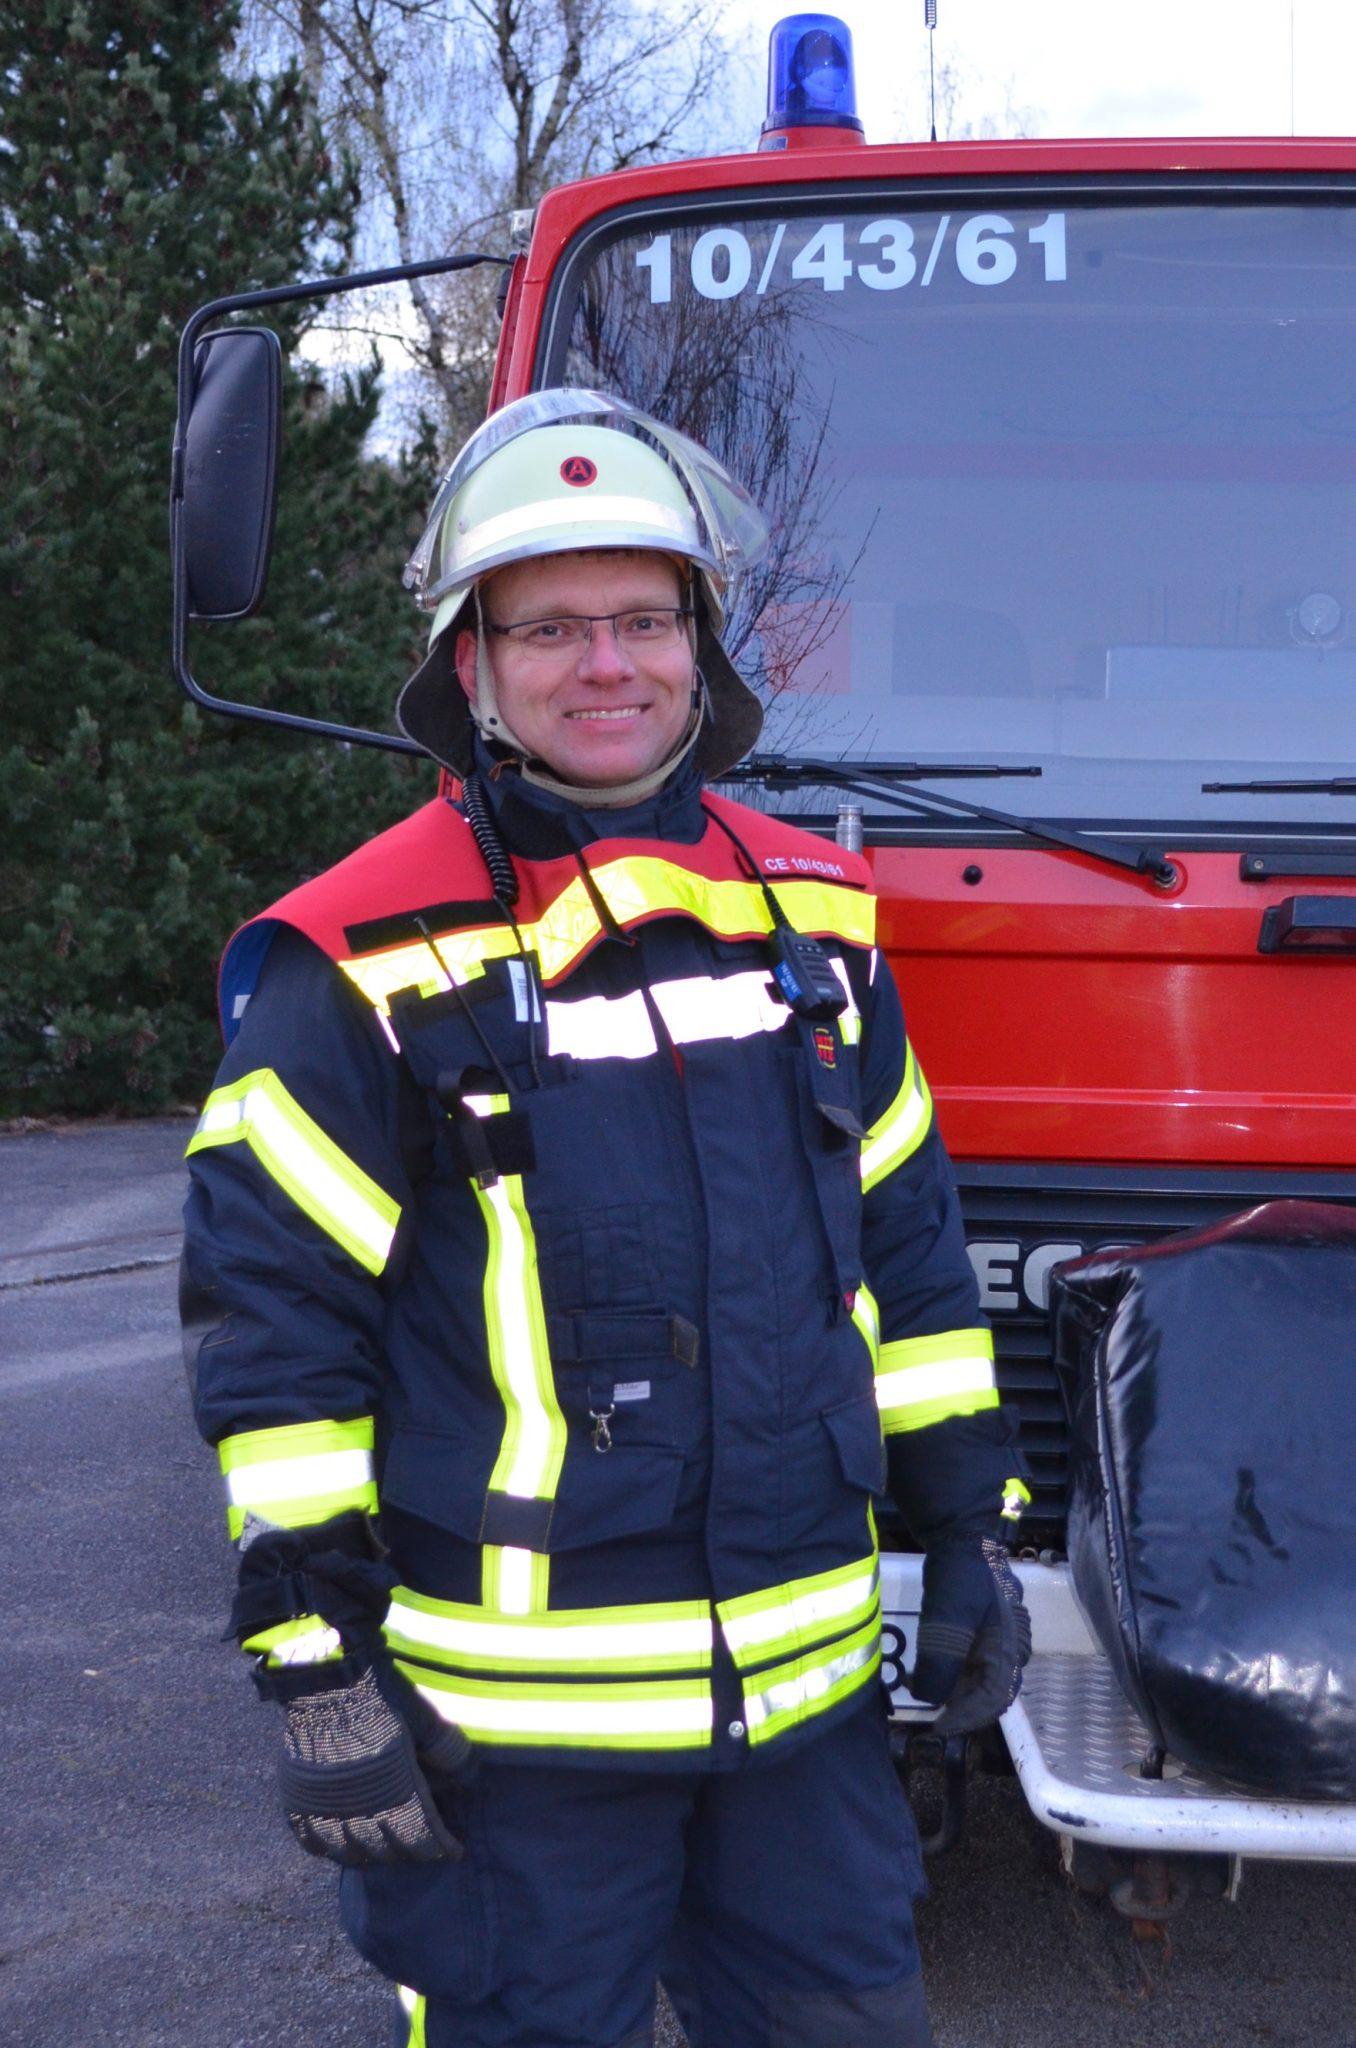 Markus Duwe